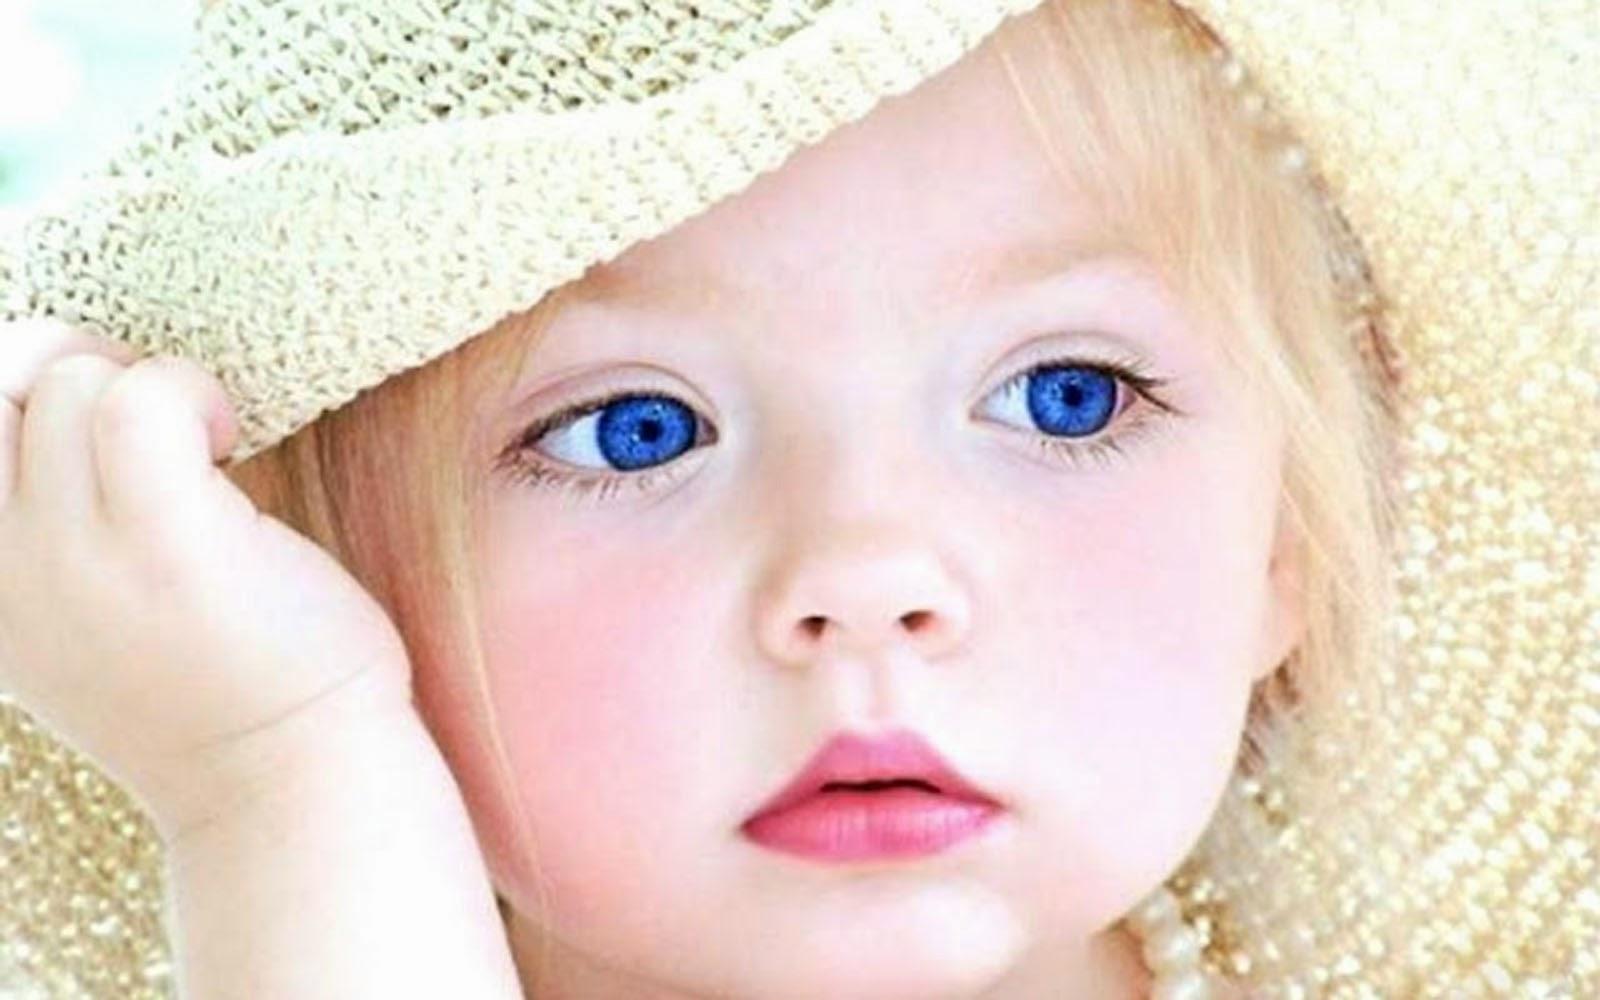 Cute Baby Wallpapers HD   beautiful desktop wallpapers 2014 1600x1000